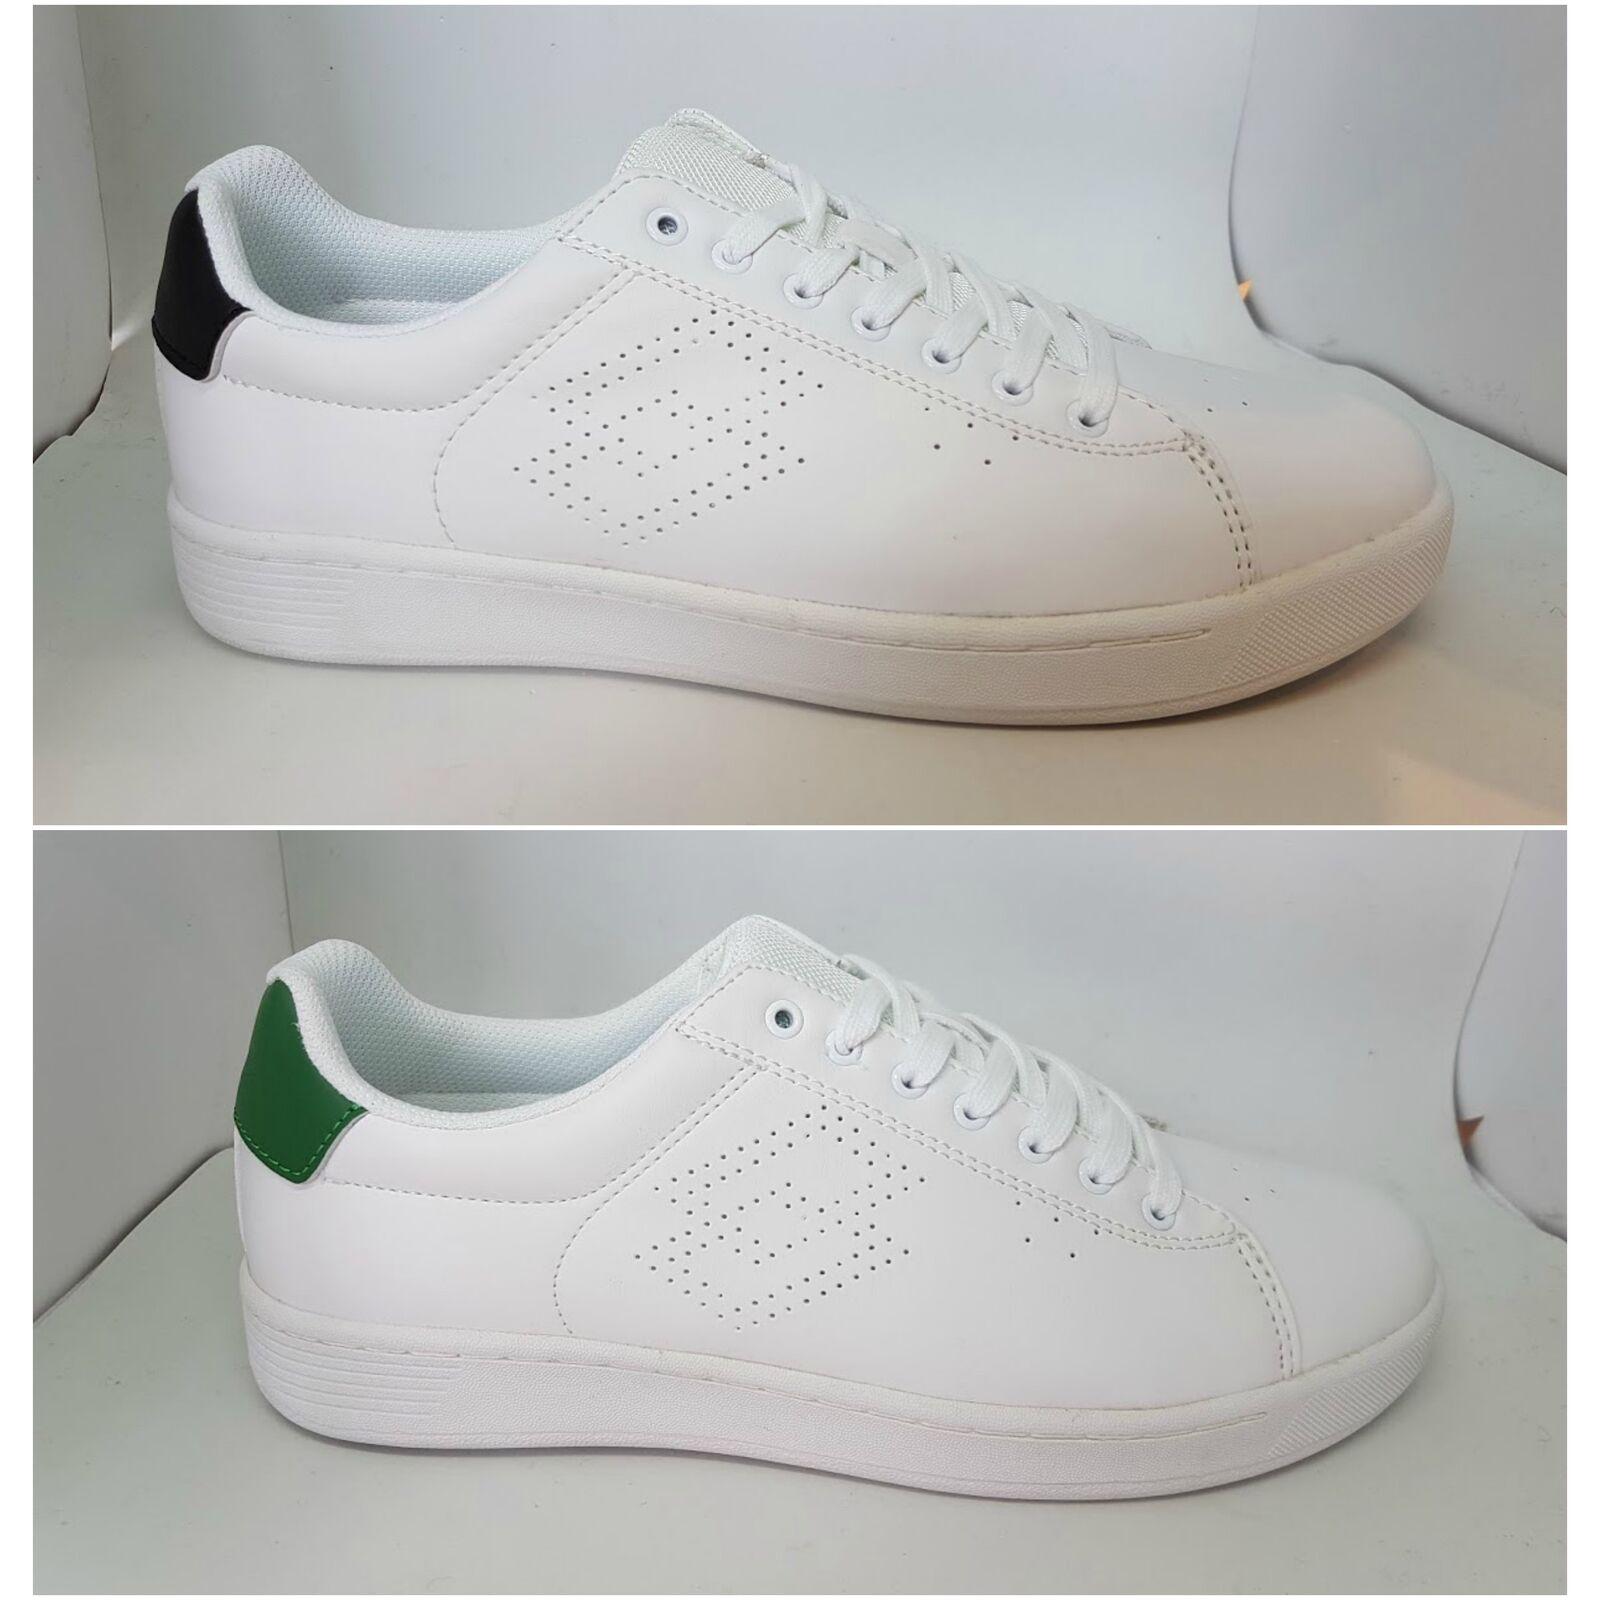 Lotto t3903 Schuhes Life's 1973 t3902 t3903 Lotto Men Sneaker Weiß green schwarz Logo Sport 201 a08766